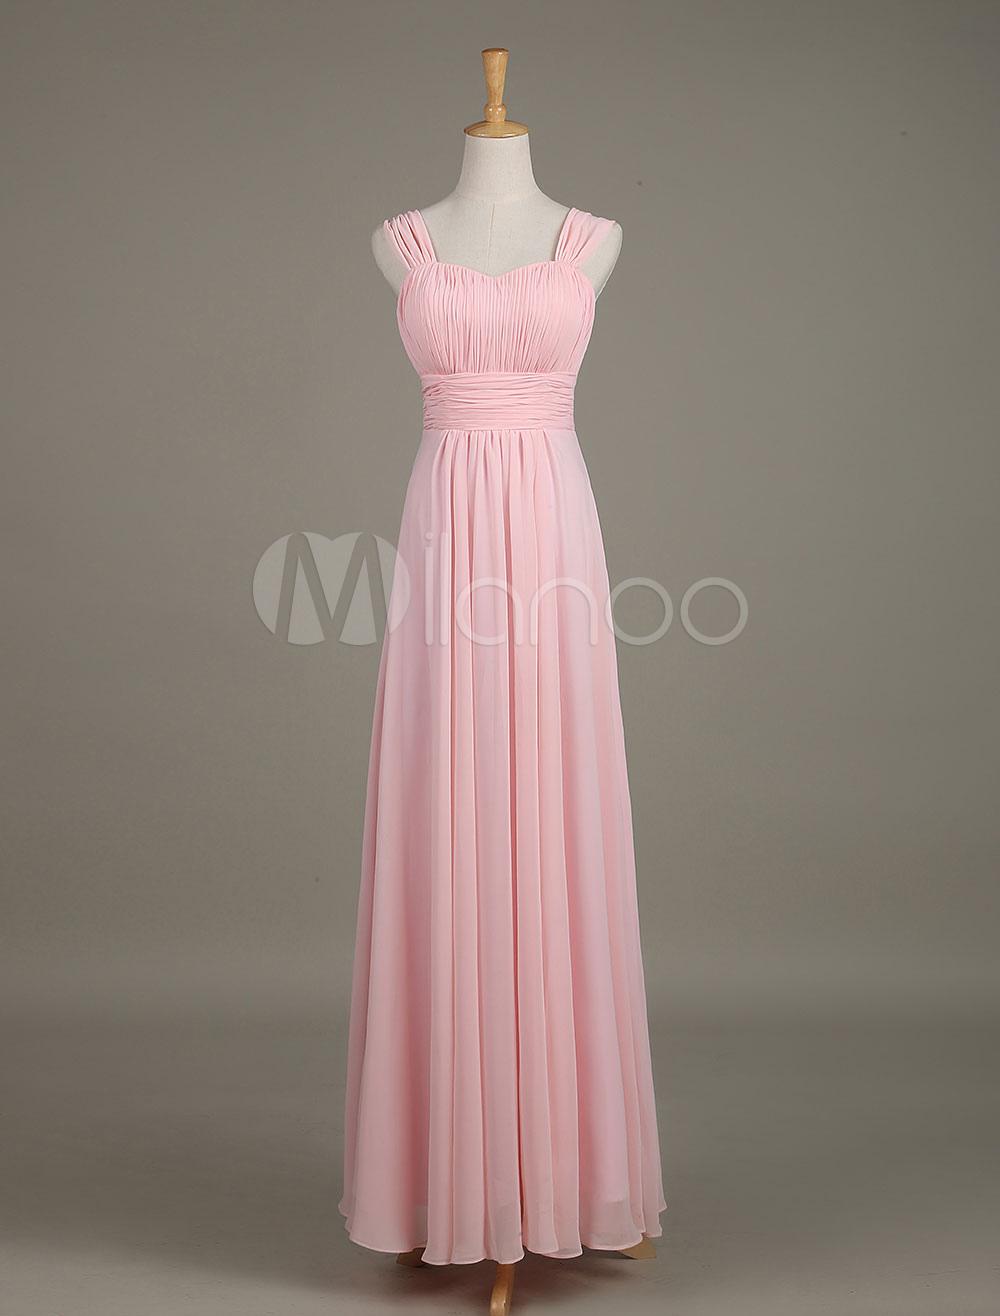 Blush Bridesmaid Dress Soft Pink Strapless Sweetheart Straps Draped A Line Maxi Wedding Party Dress photo